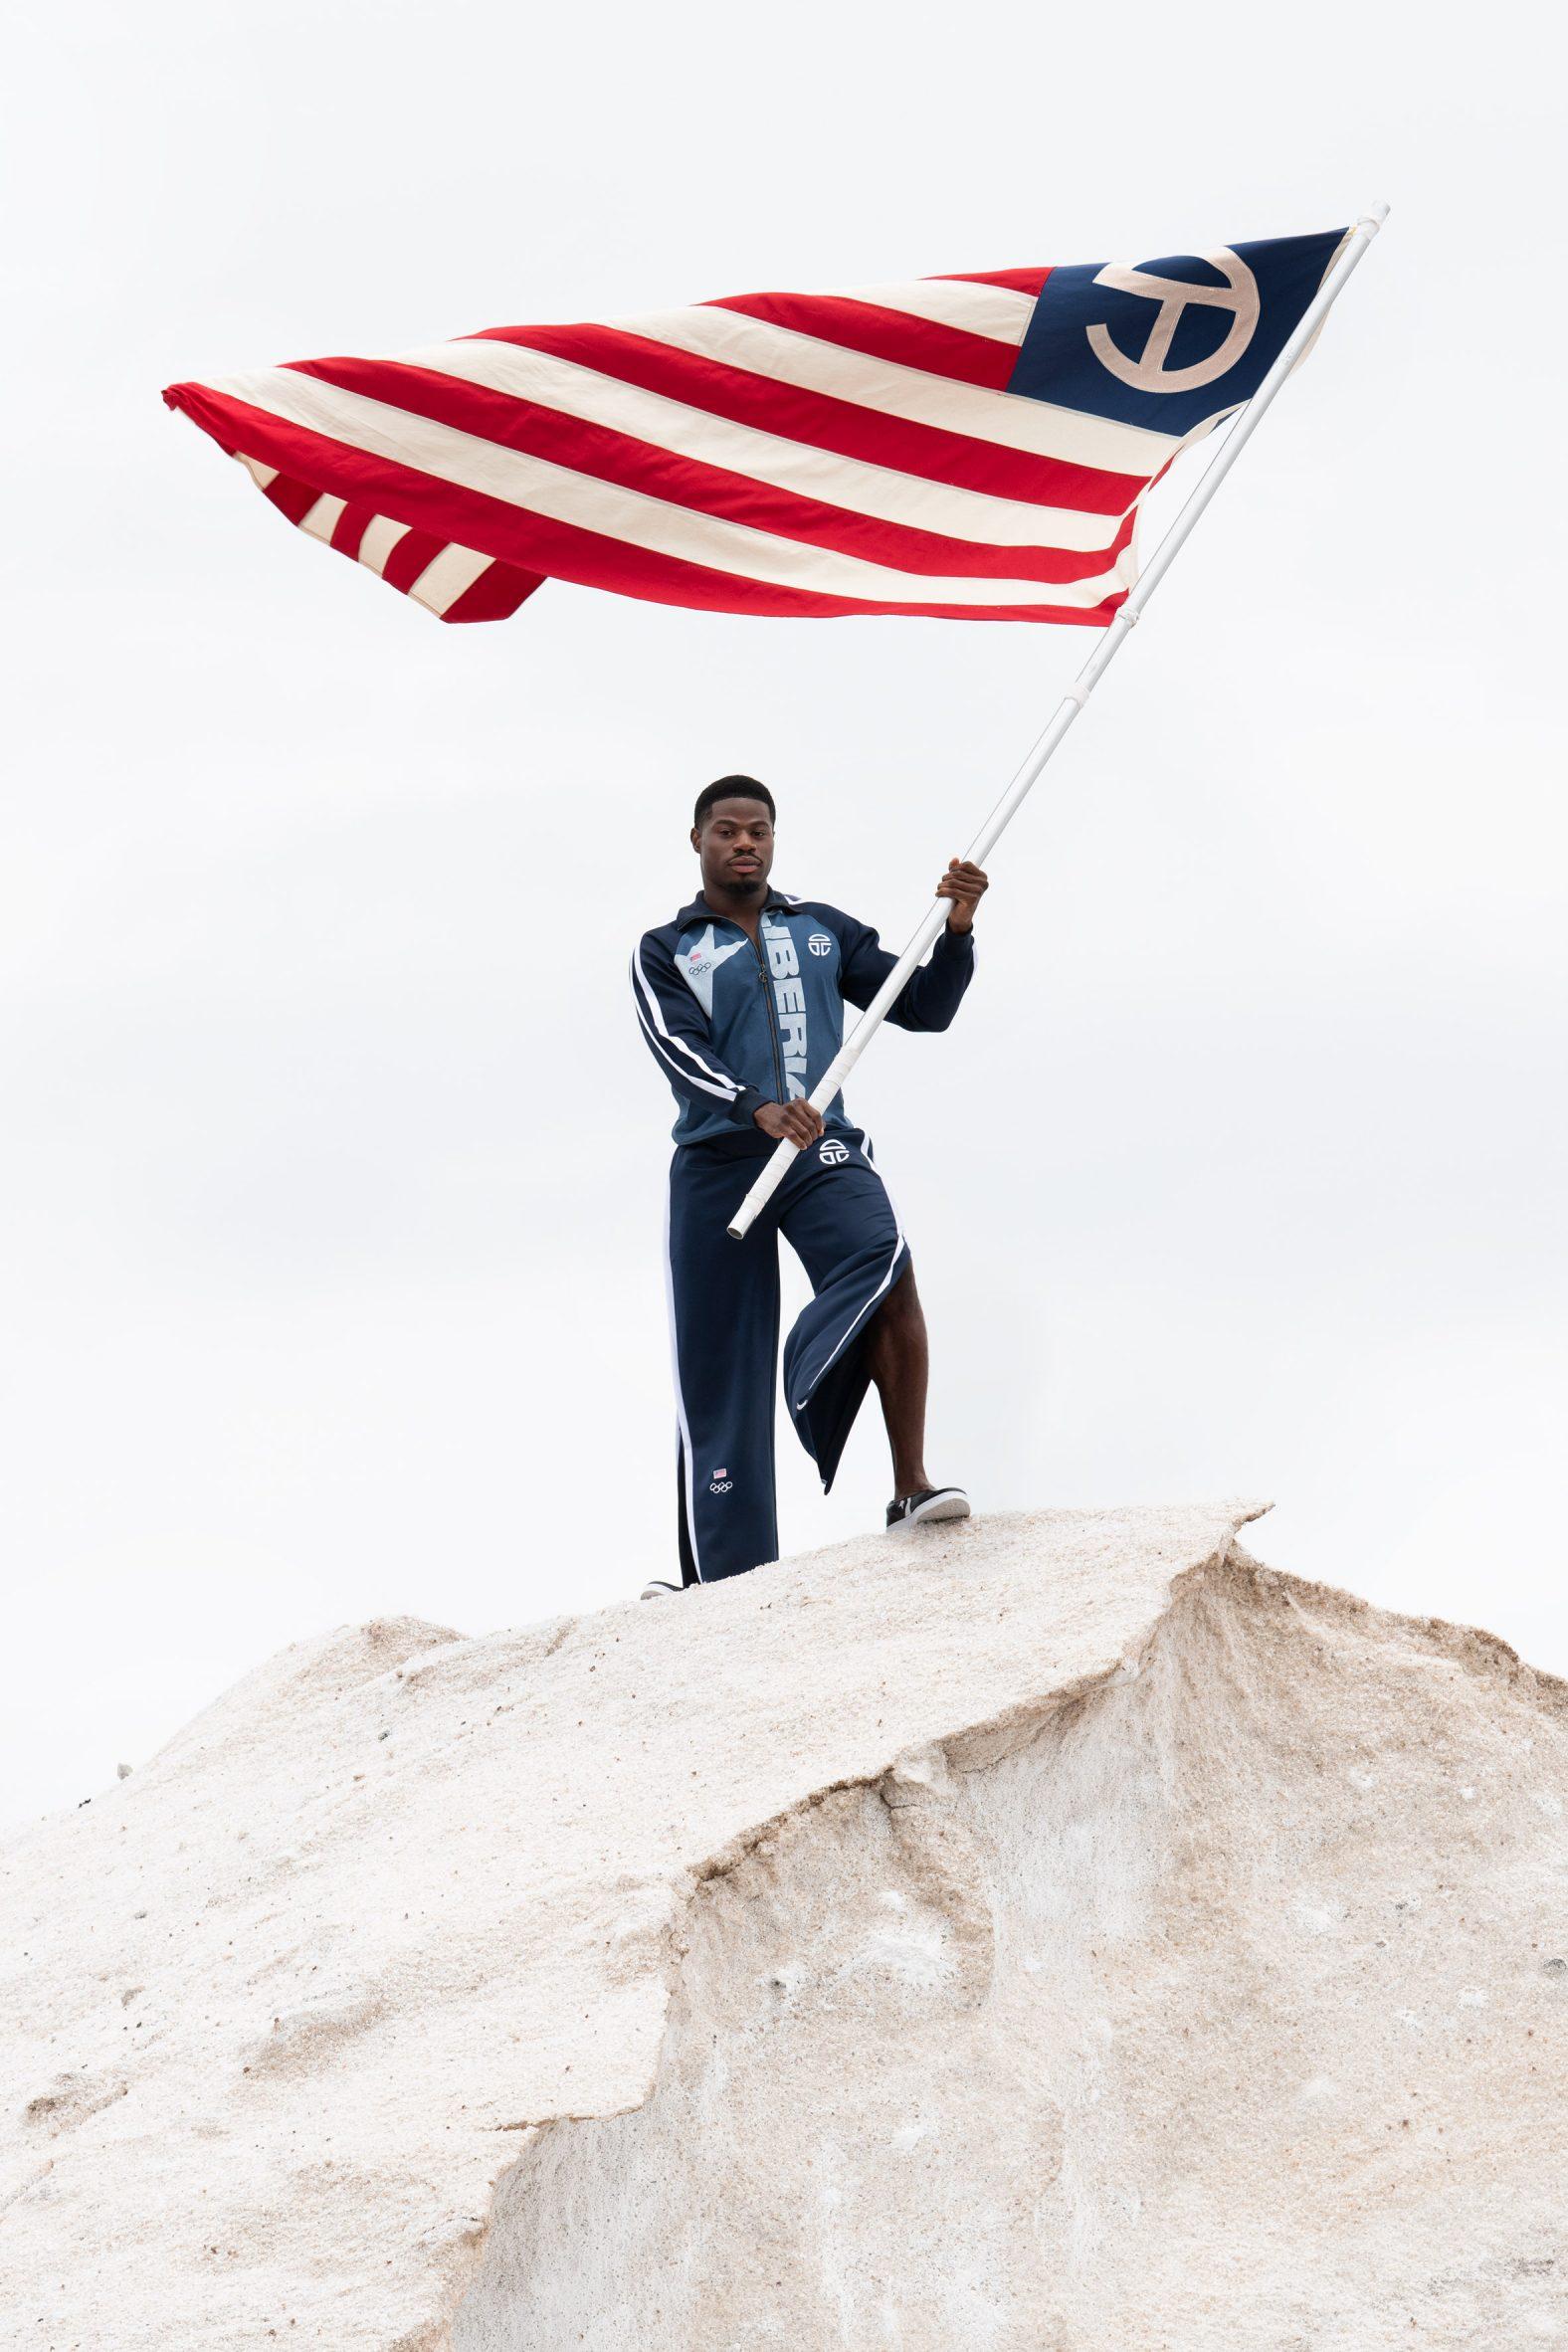 A man waves a flag while wearing the Telfar Olympic uniform